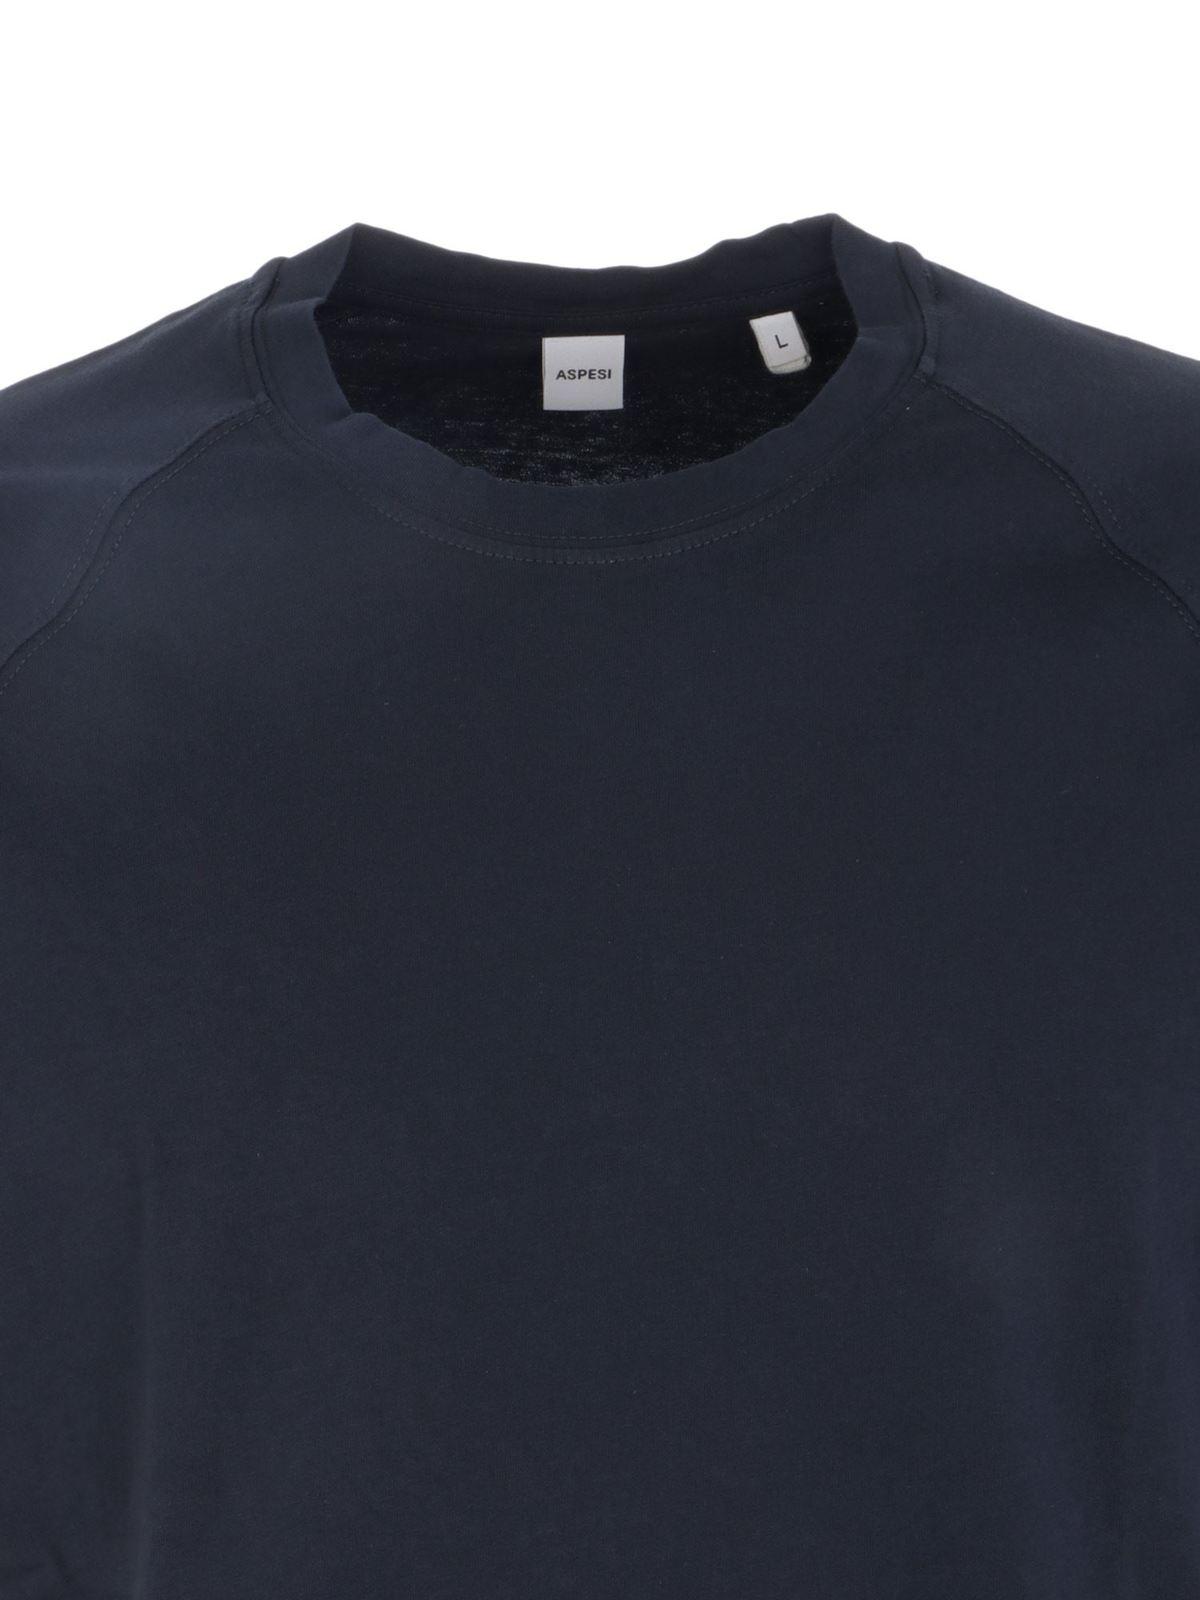 Picture of Aspesi | Tshirt